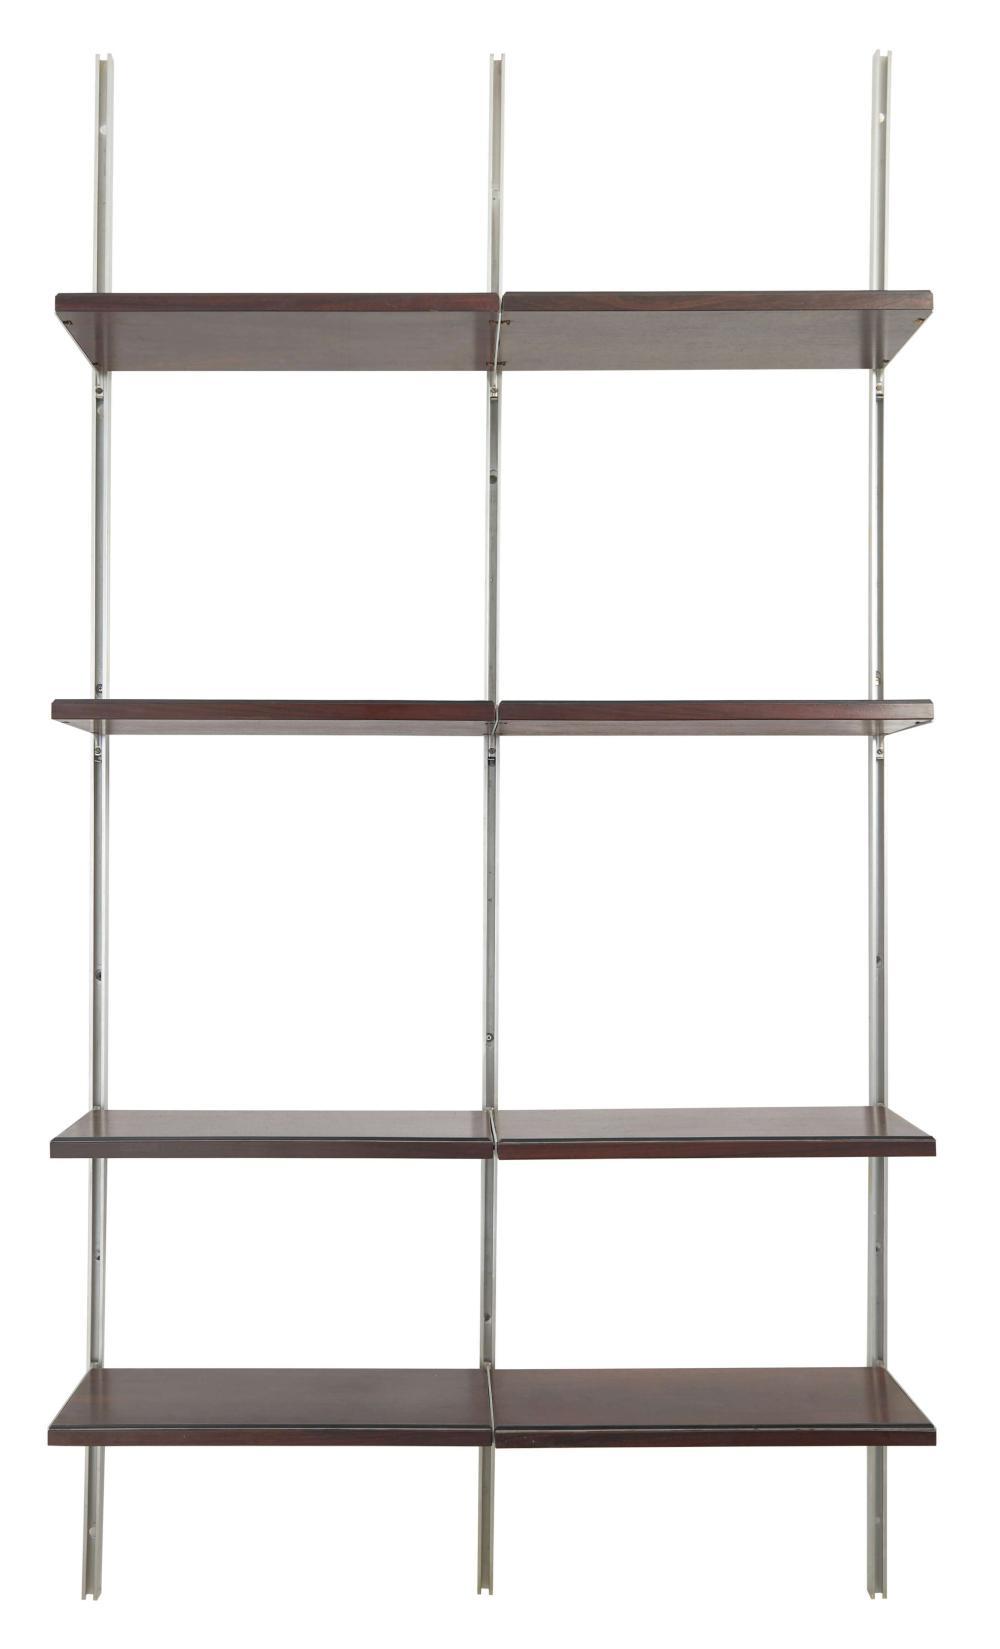 Osvaldo BORSANI (1911-1985) Bibliothèque mod. E 22 - Création 1951 Structure en aluminium, étagères en bois